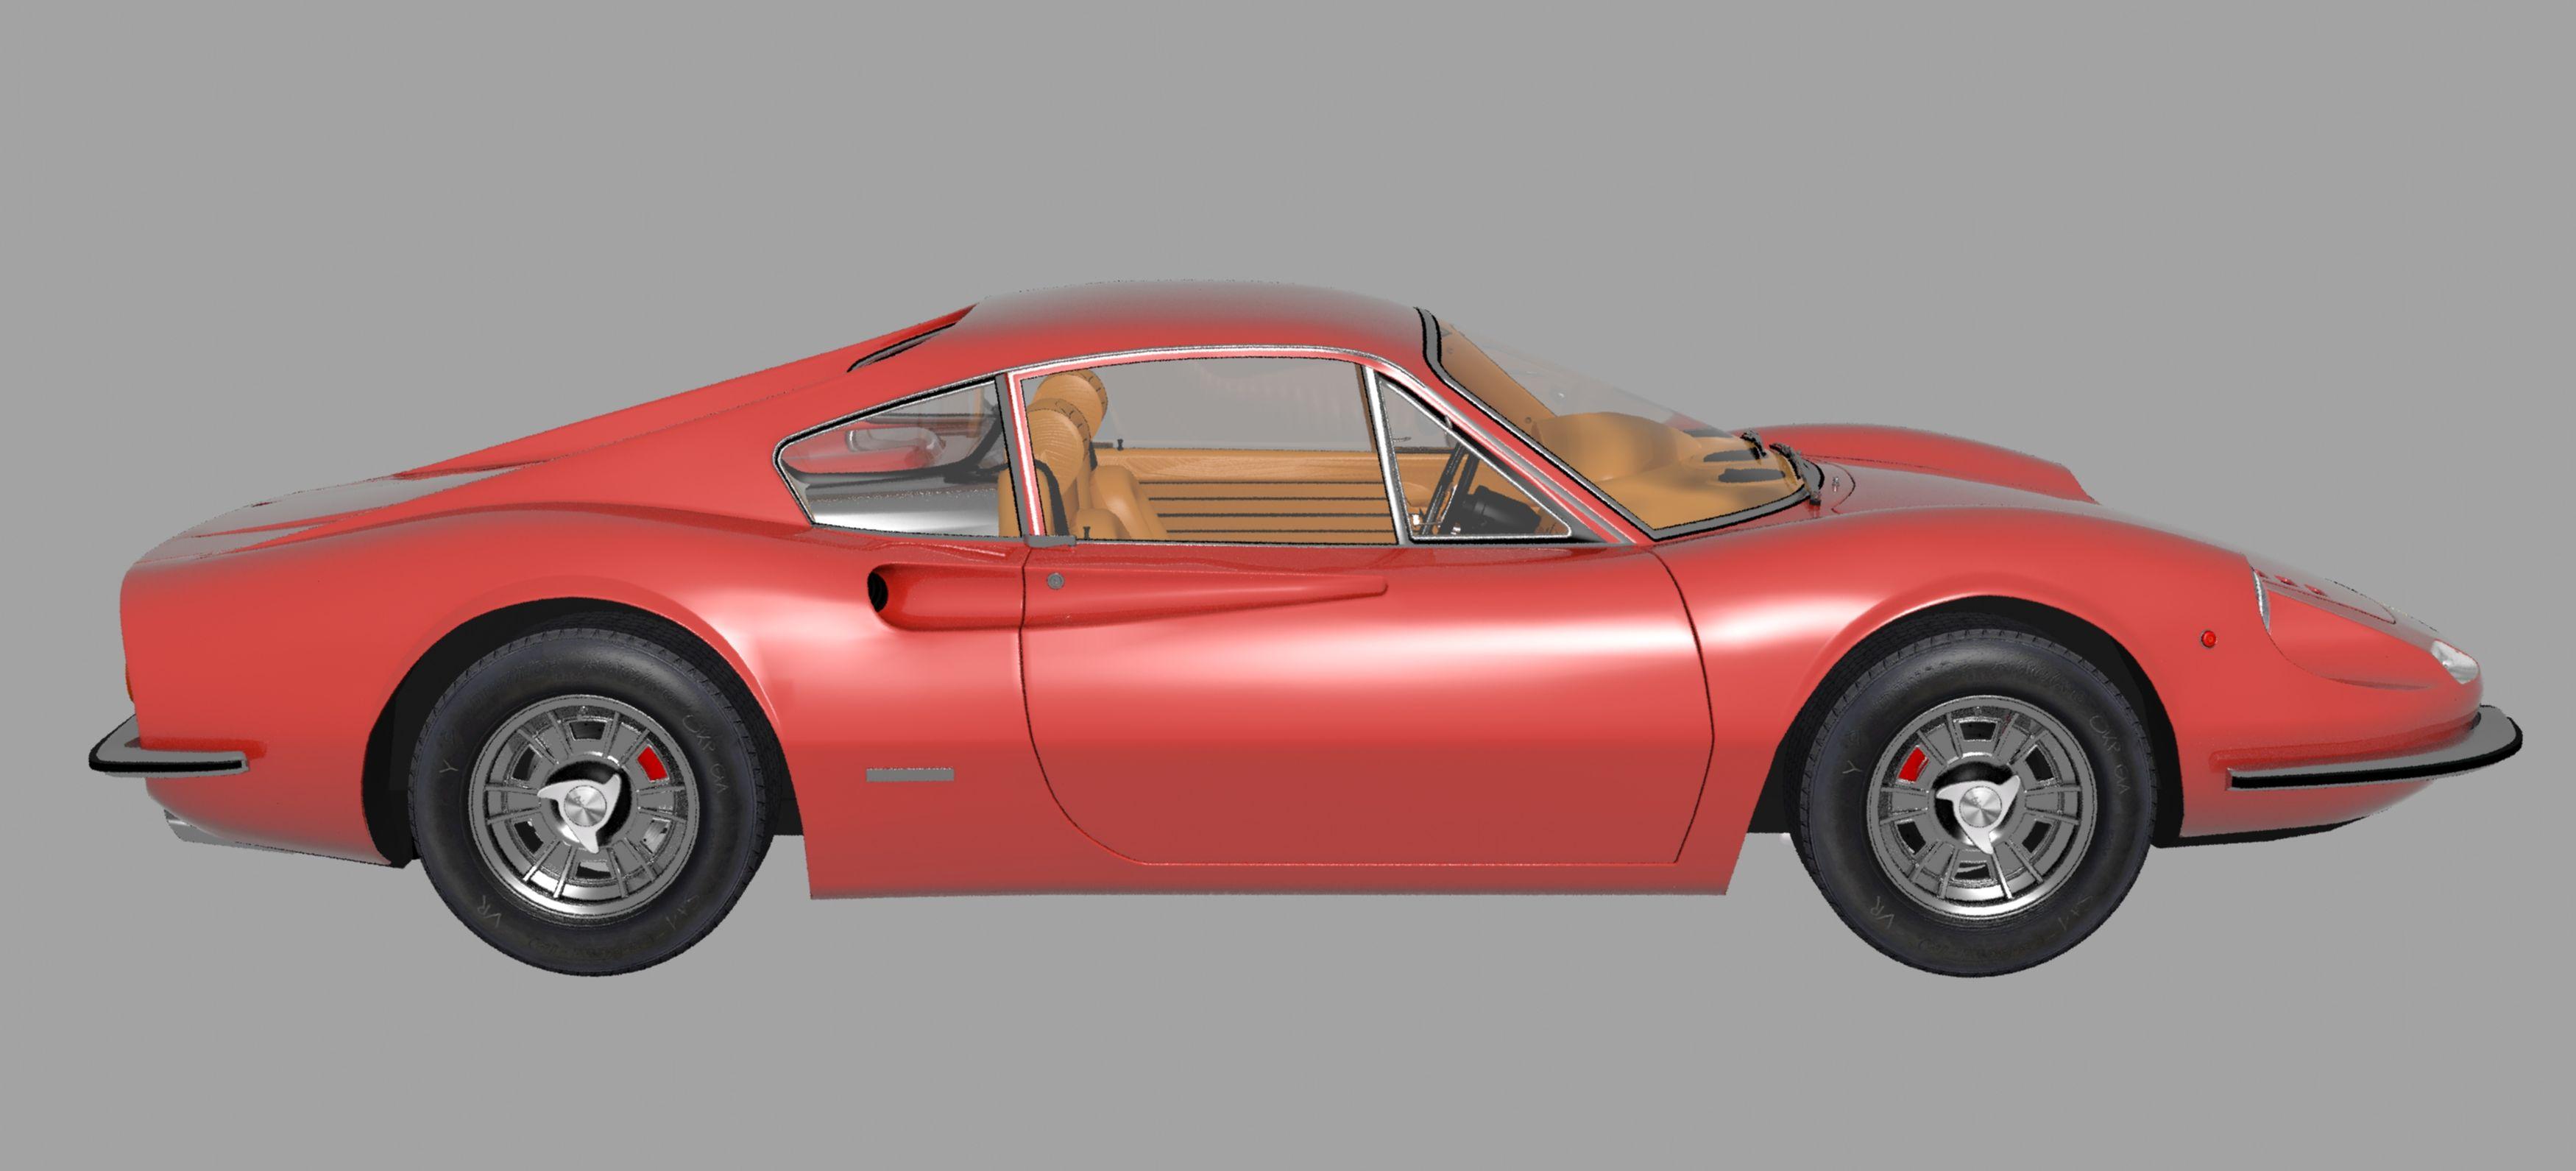 Ferrari-dino-246gt-7-3500-3500